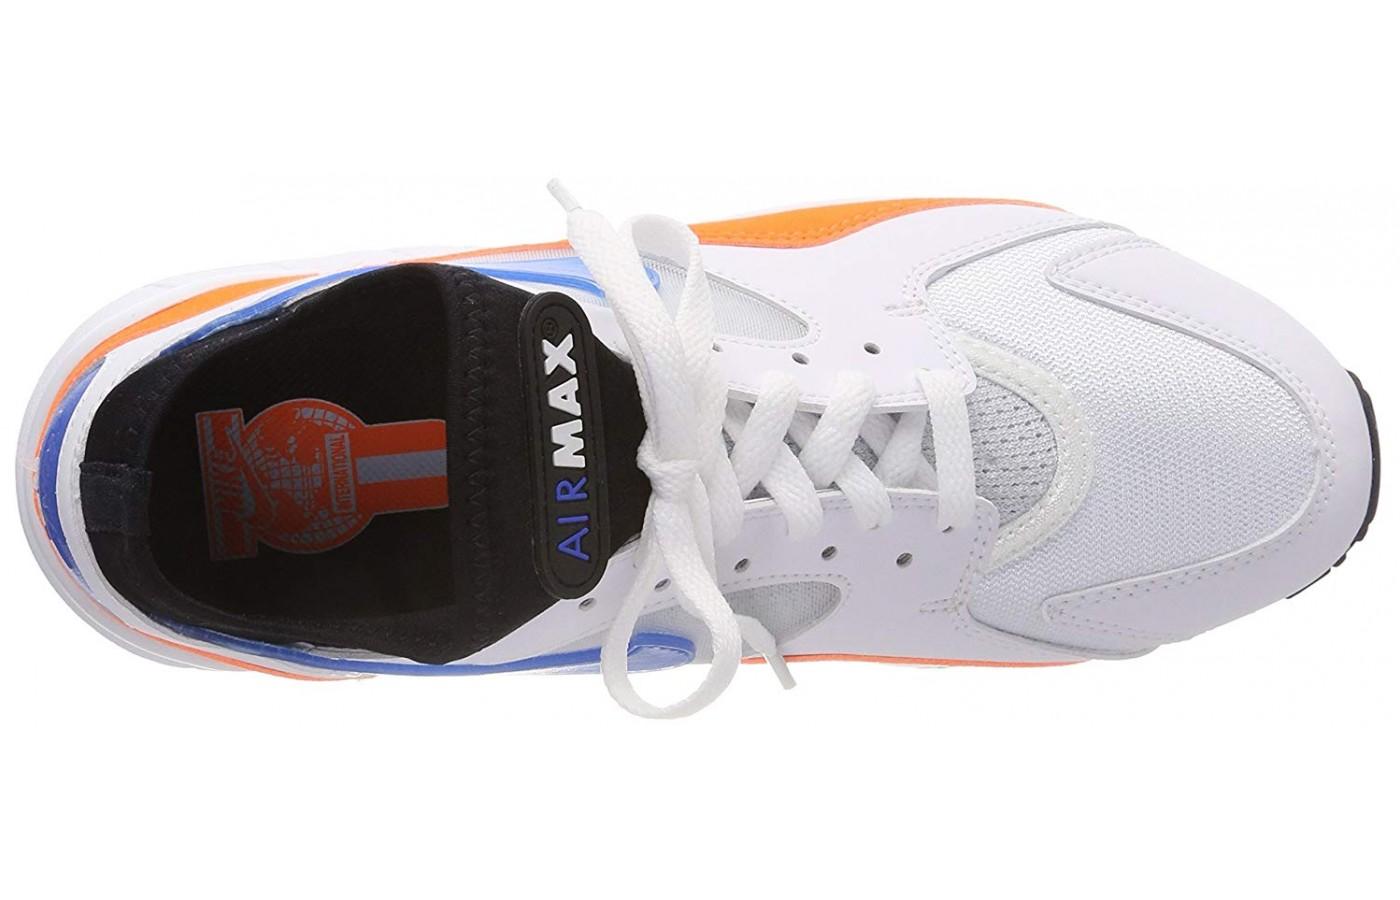 Air Max 93 upper